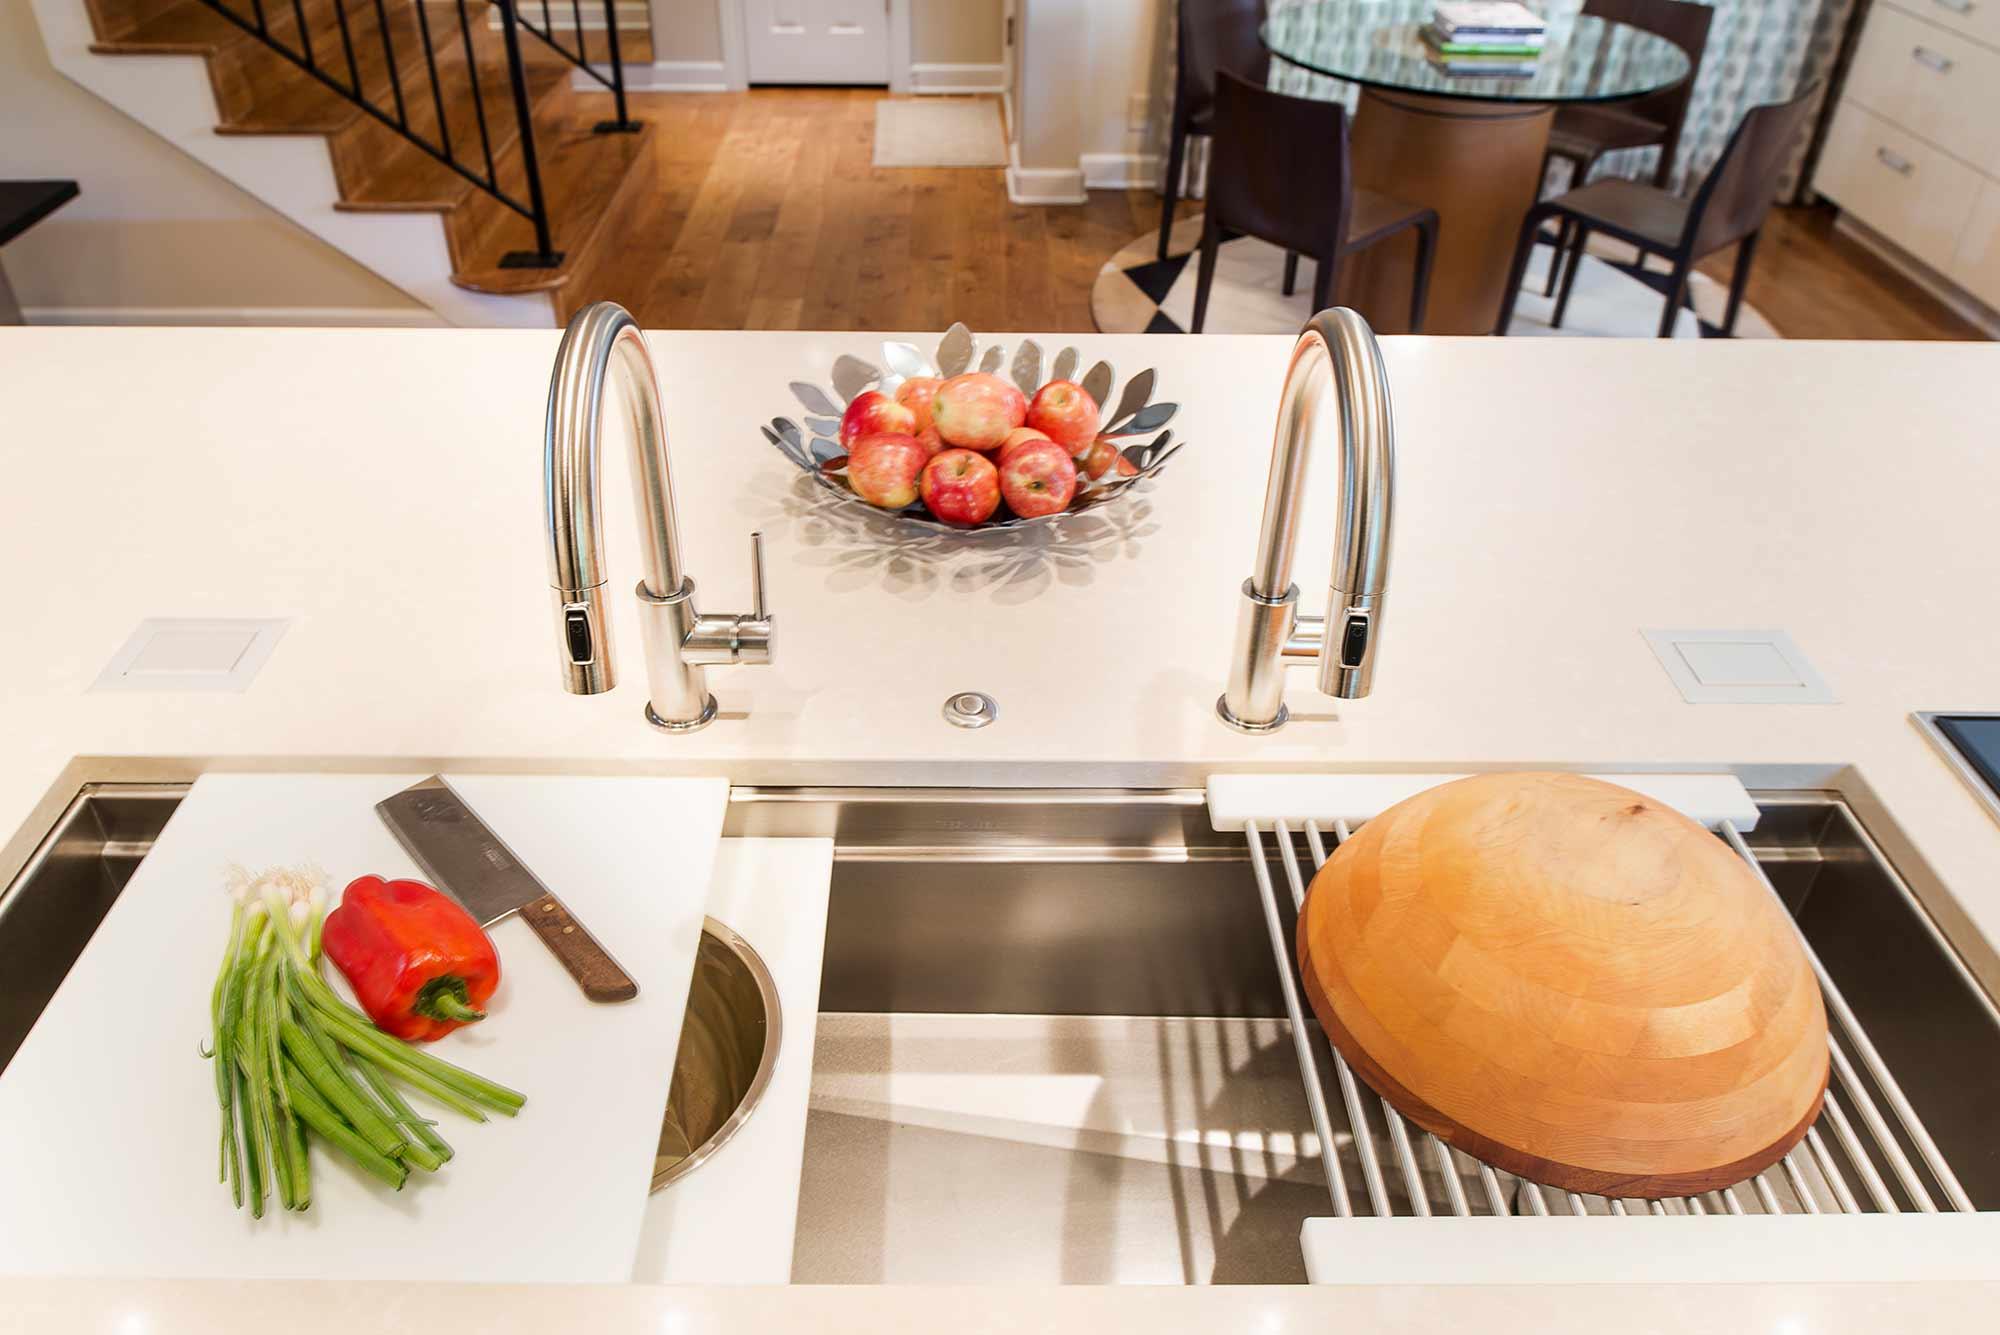 Chrome And Cream Kitchen Ideas Tulsa Ok & Used Kitchen Cabinets Tulsa Ok | Kitchen Ideas Tulsa Kitchen ...